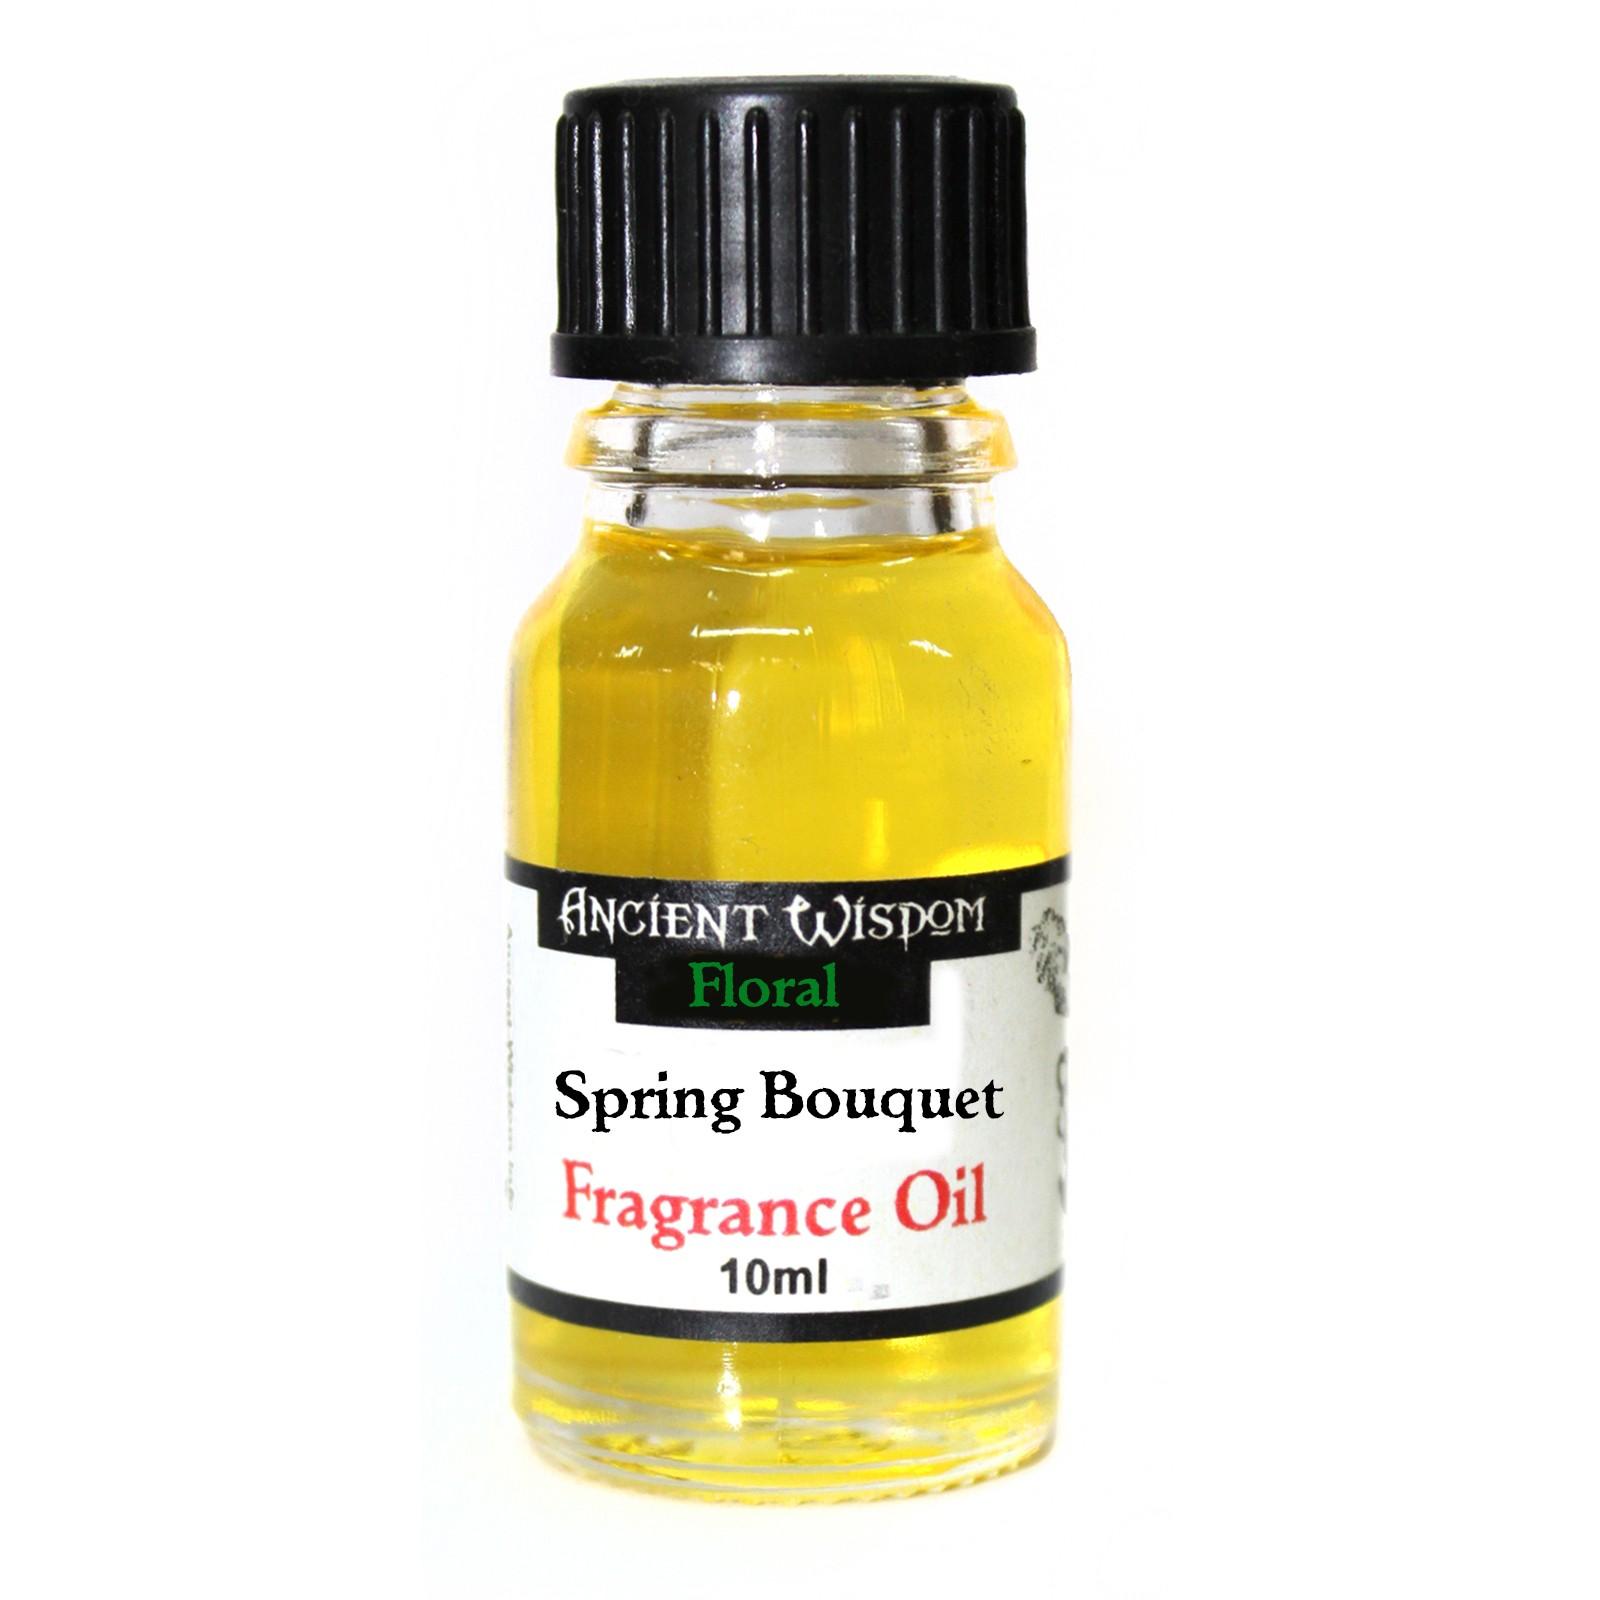 10ml Spring Bouquet Fragrance Oil